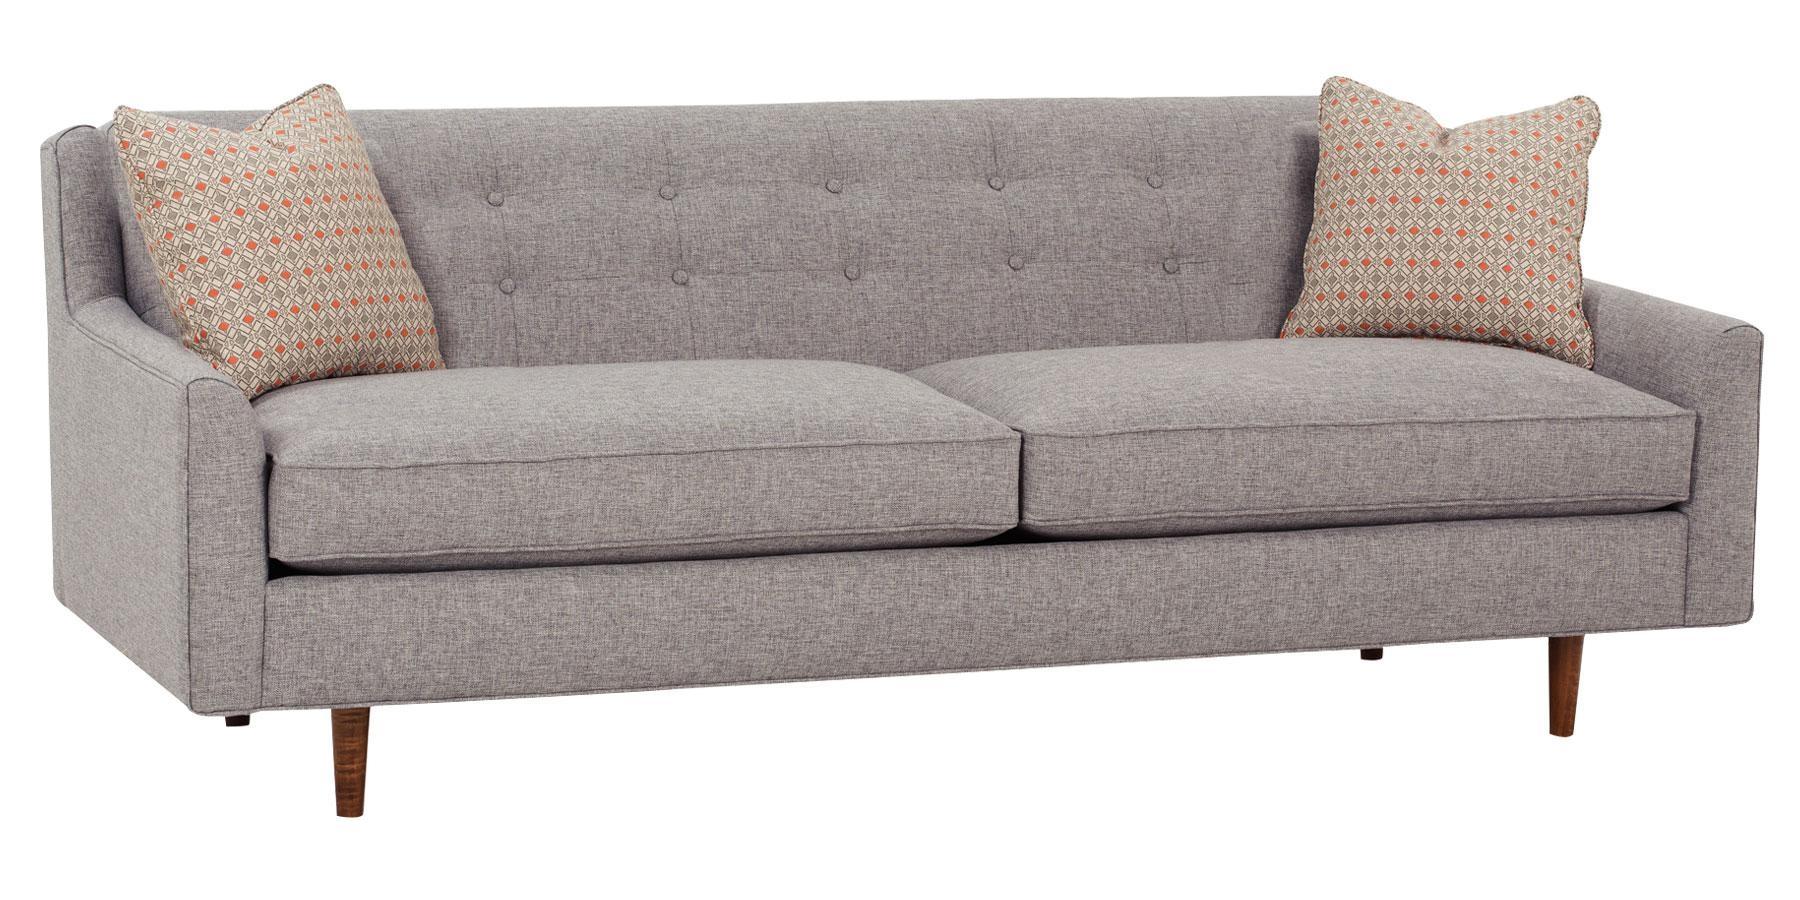 20 Best Ideas Danish Modern Sofas  Sofa Ideas